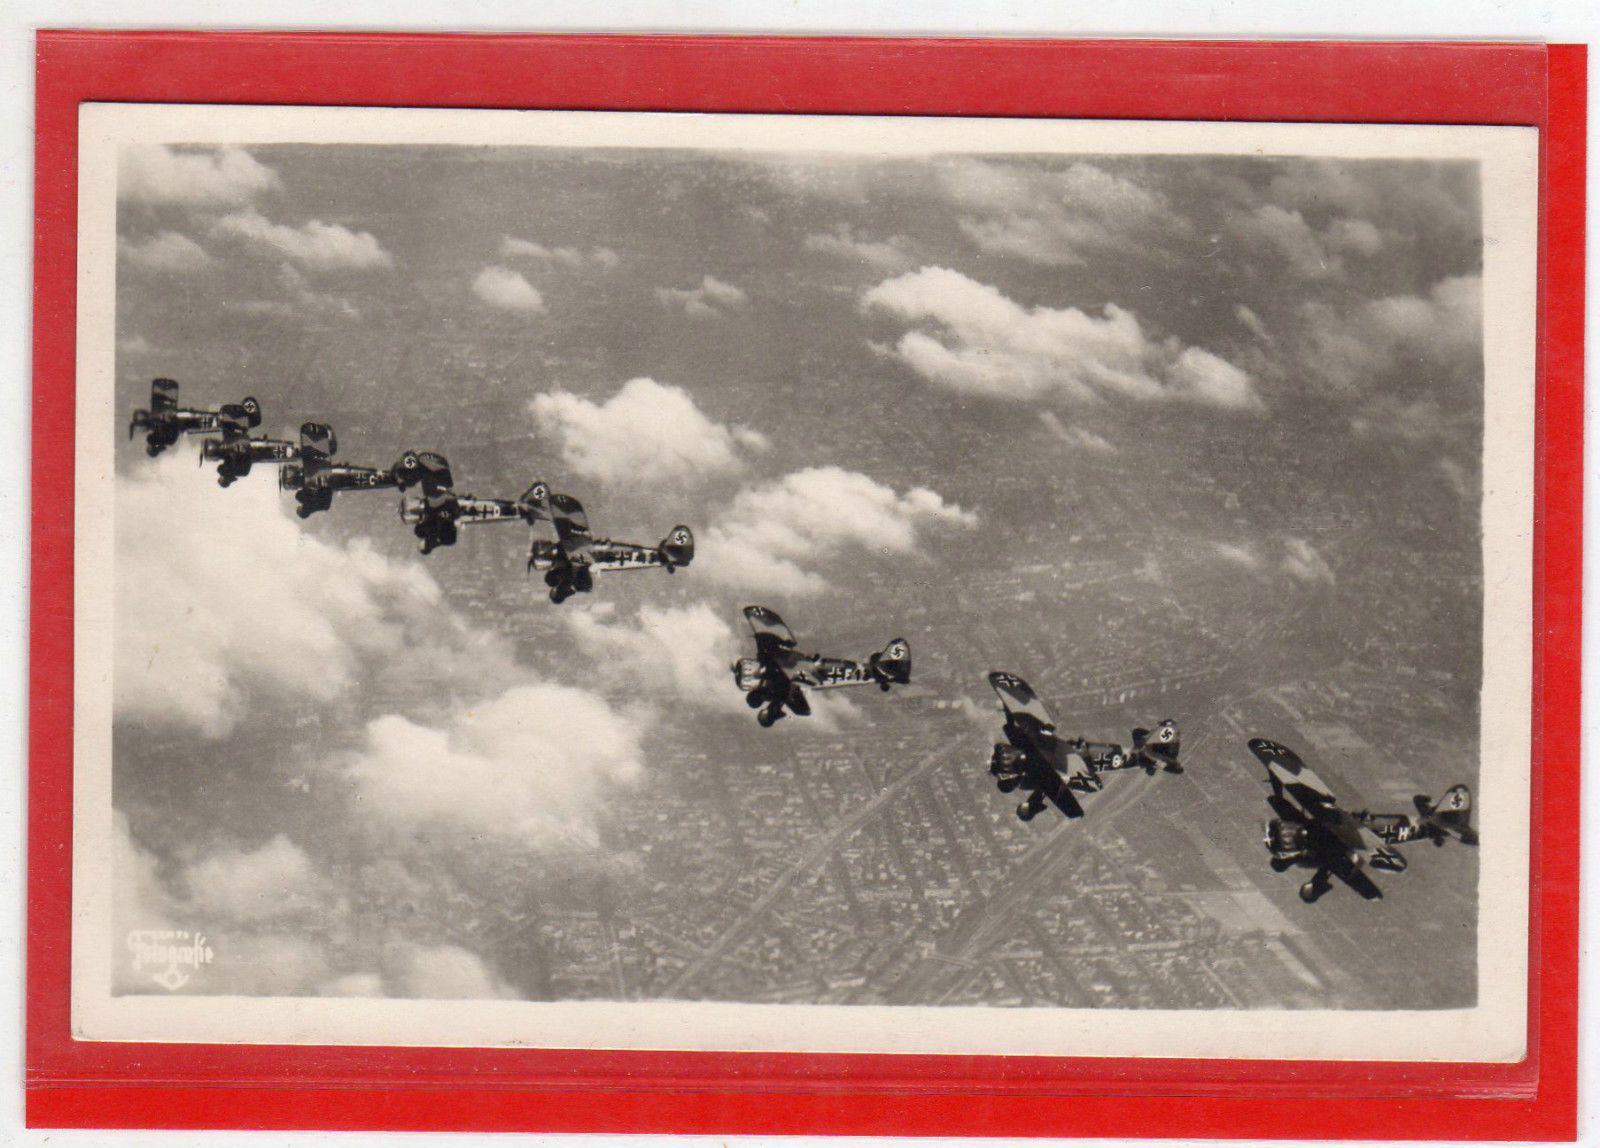 hs123_30_postcard.JPG